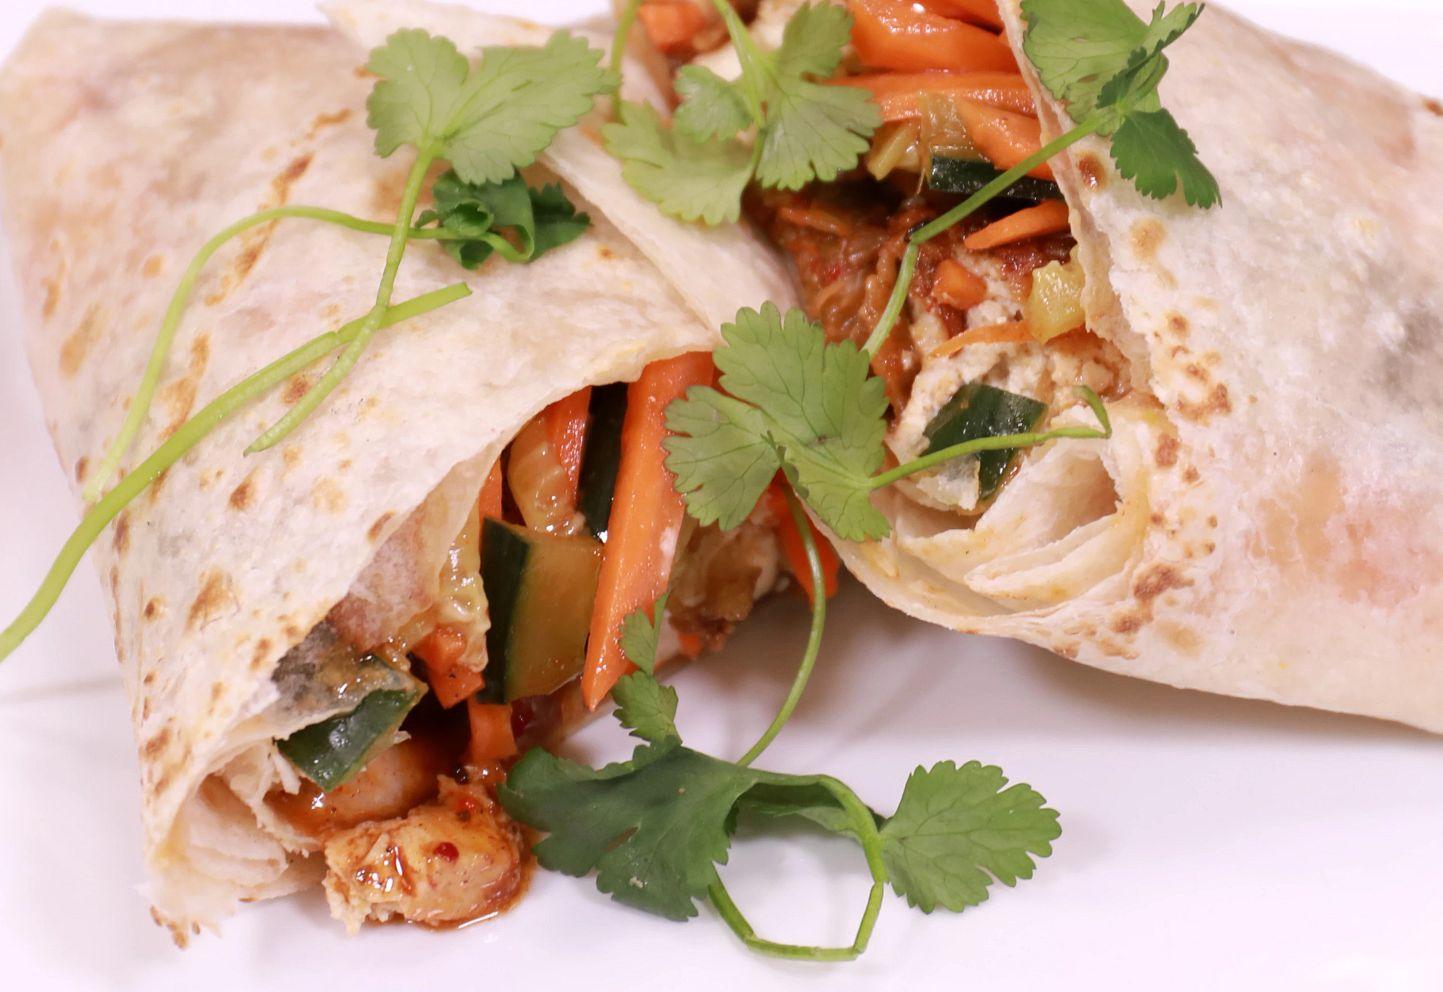 a burrito on a plate